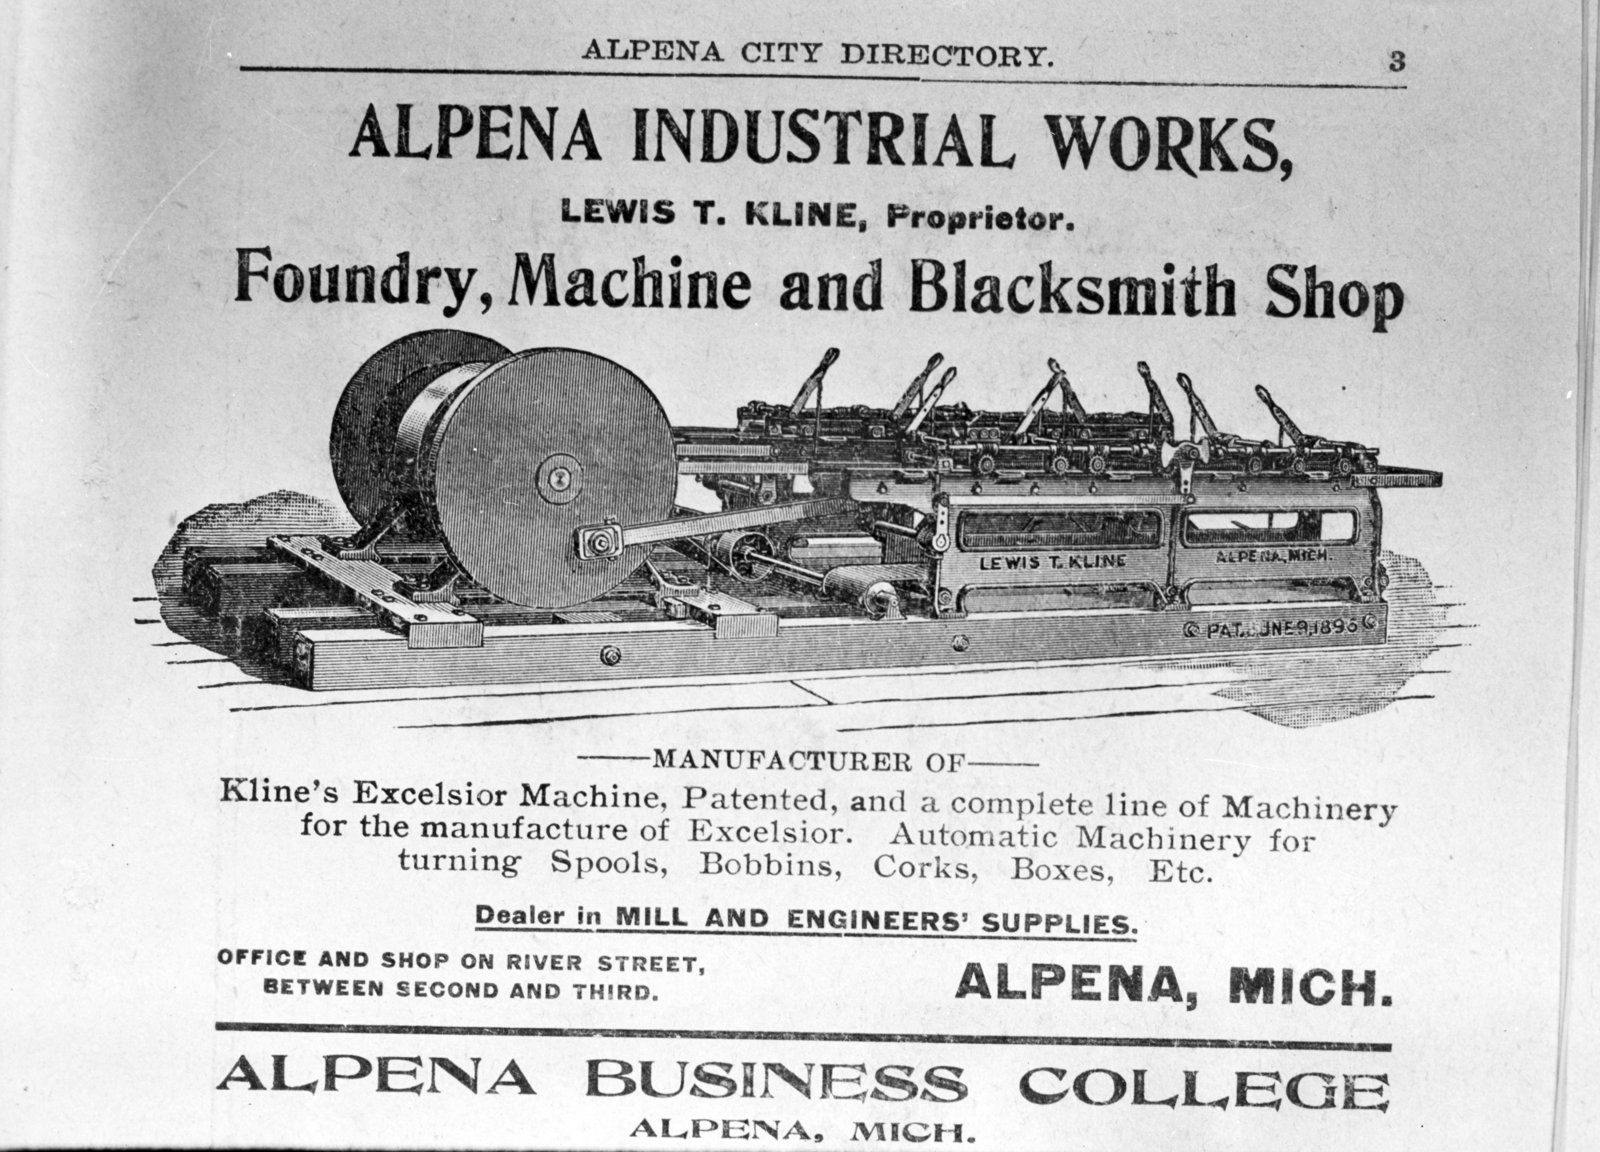 Alpena Industrial Works